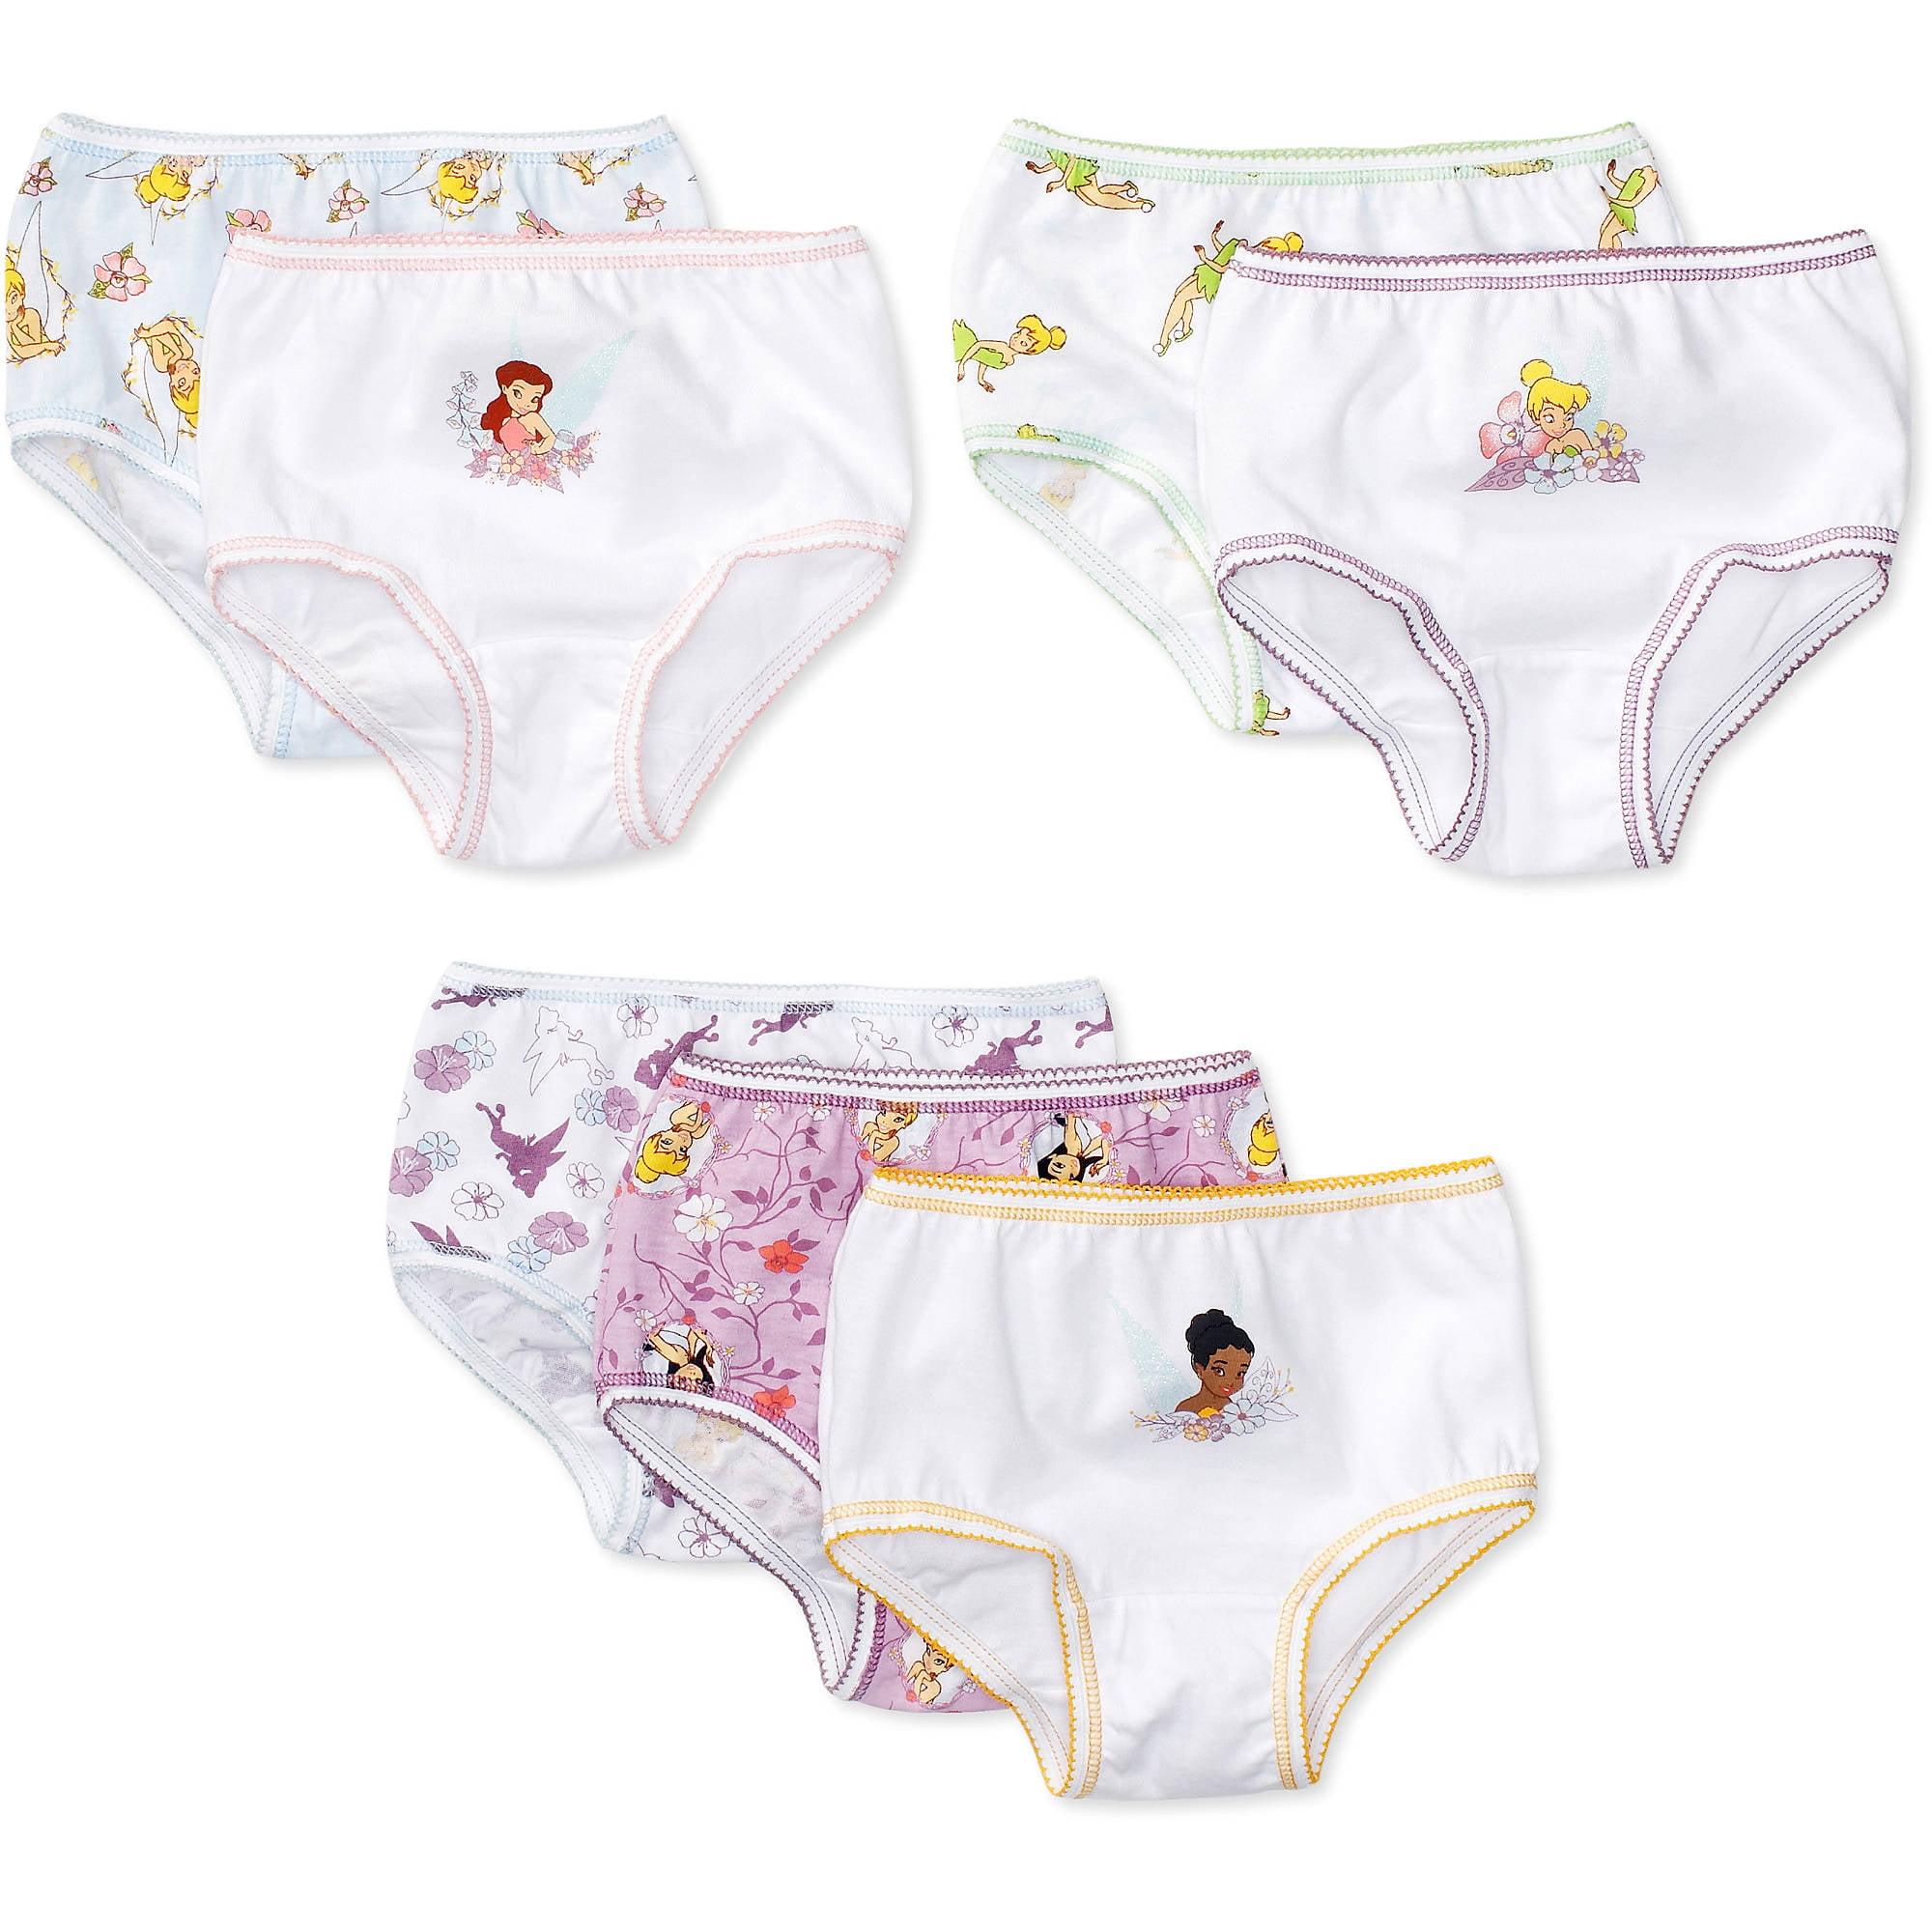 Junior panty model wet